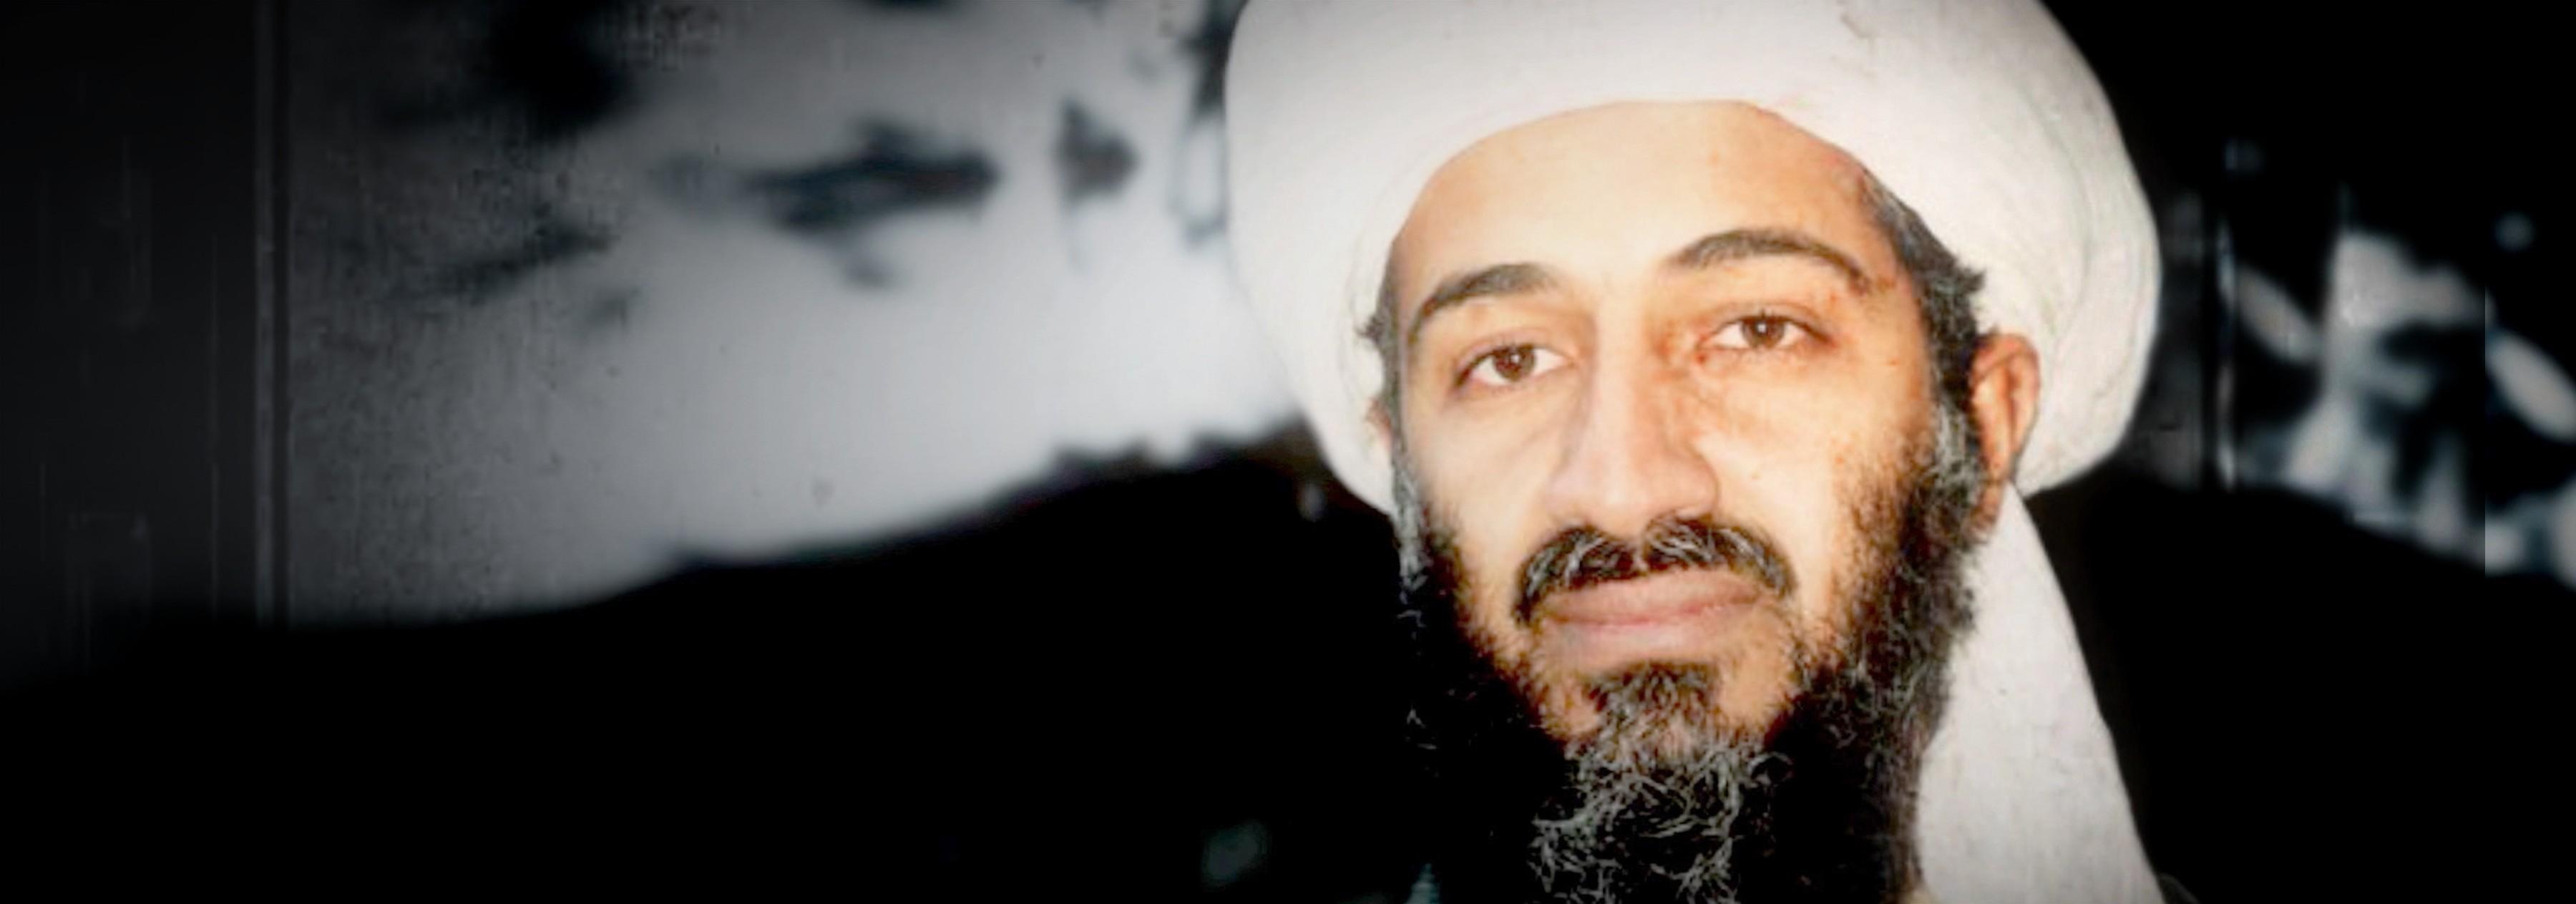 Al Qaeda: World of Terrorism